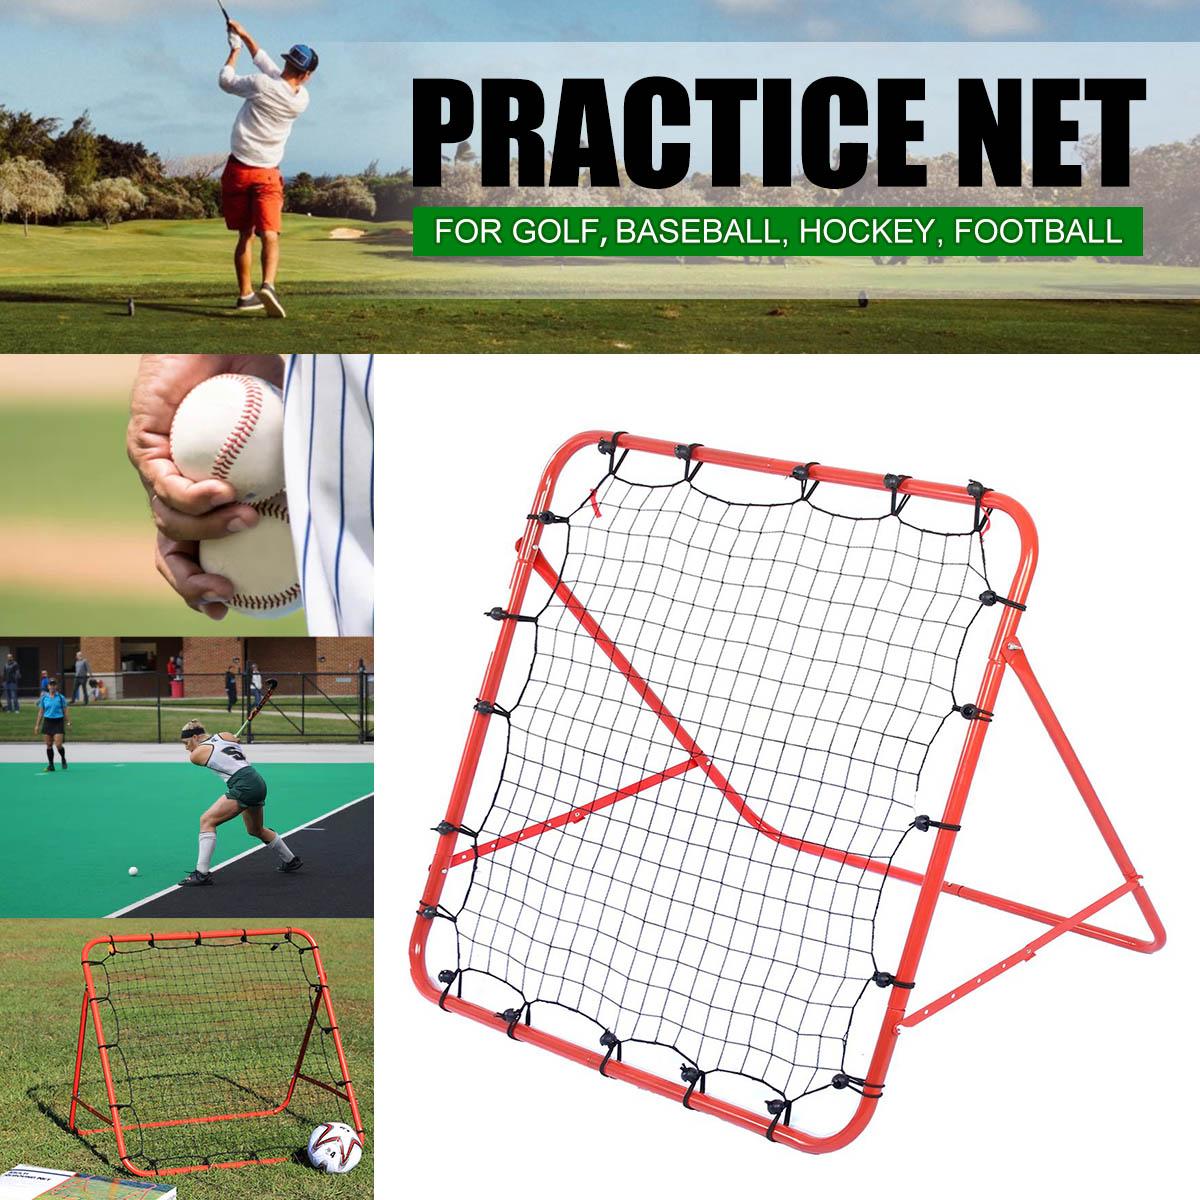 Football Football rebond cible maille filet réglable Kickback Football cible but Baseball Football entraînement outil d'aide